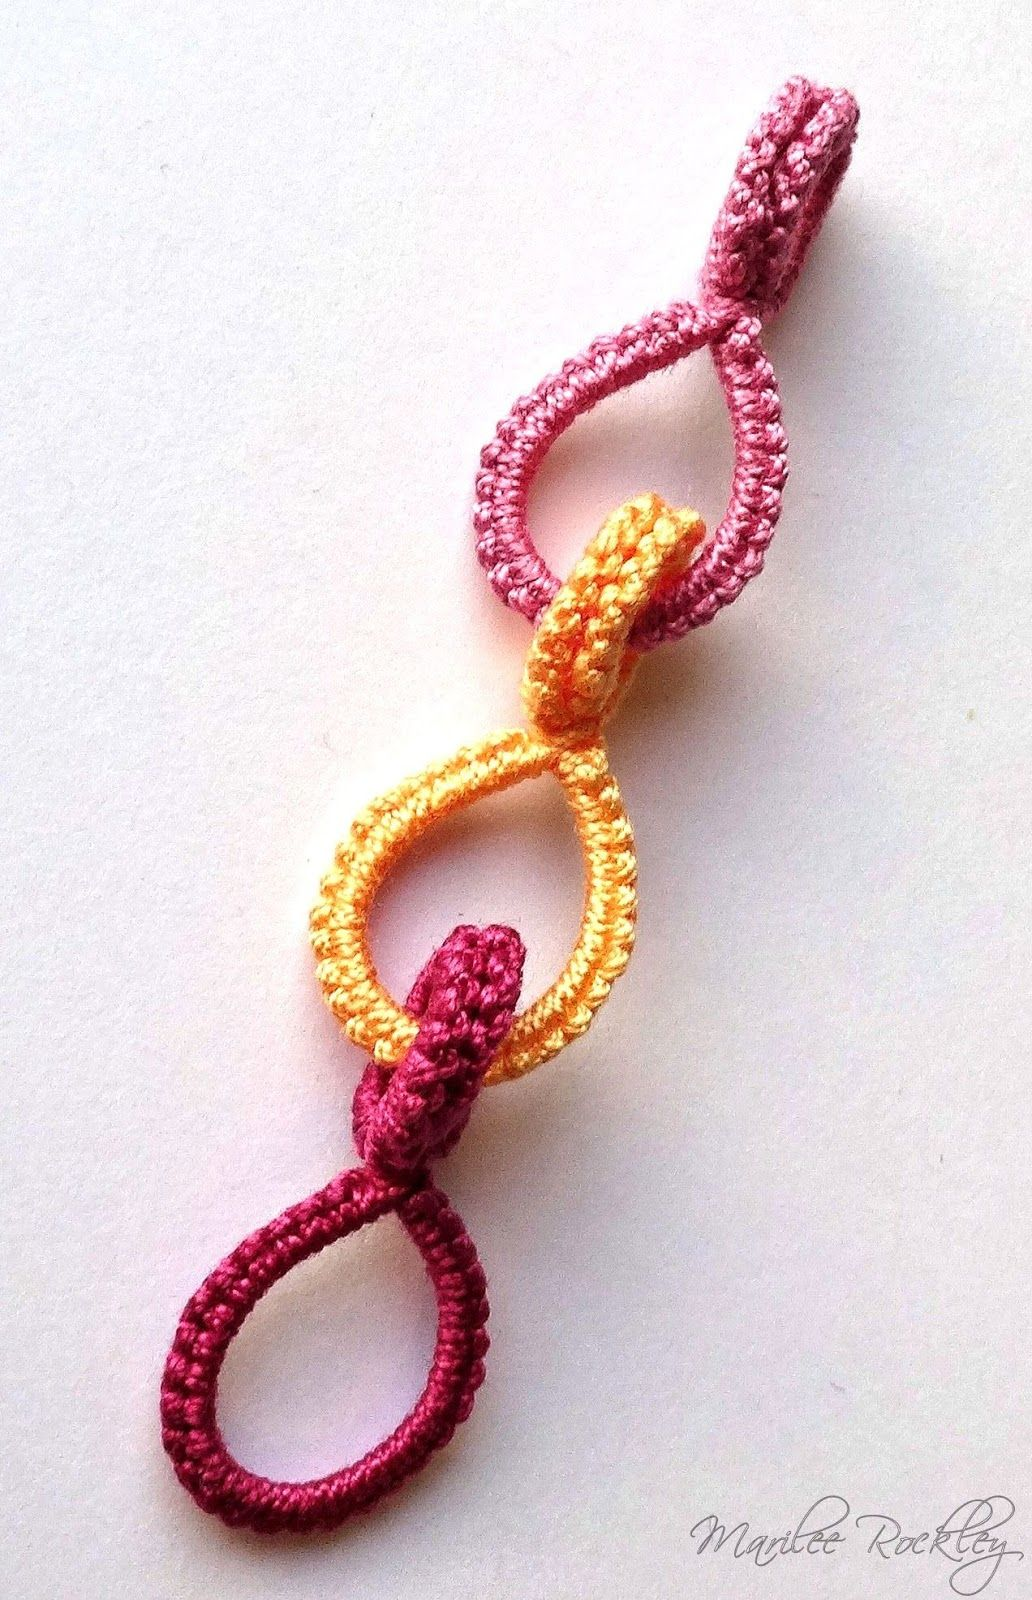 Chiacchierino Blog di Yarnplayer: Tatted Cotter Pin Links Tutorial ...